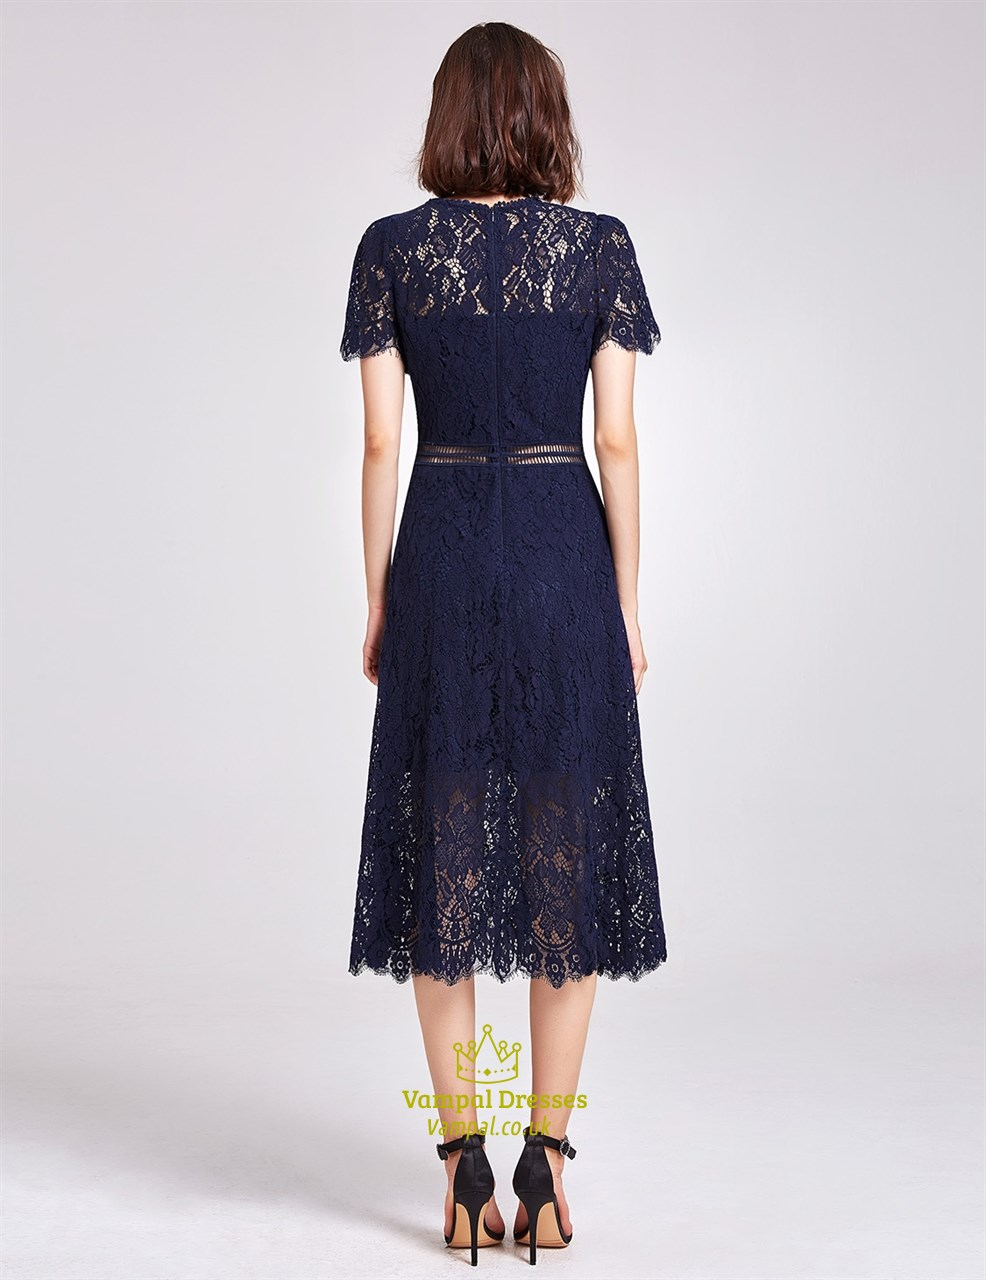 Elegant Navy Blue Short Sleeve A-Line Tea Length Lace ...